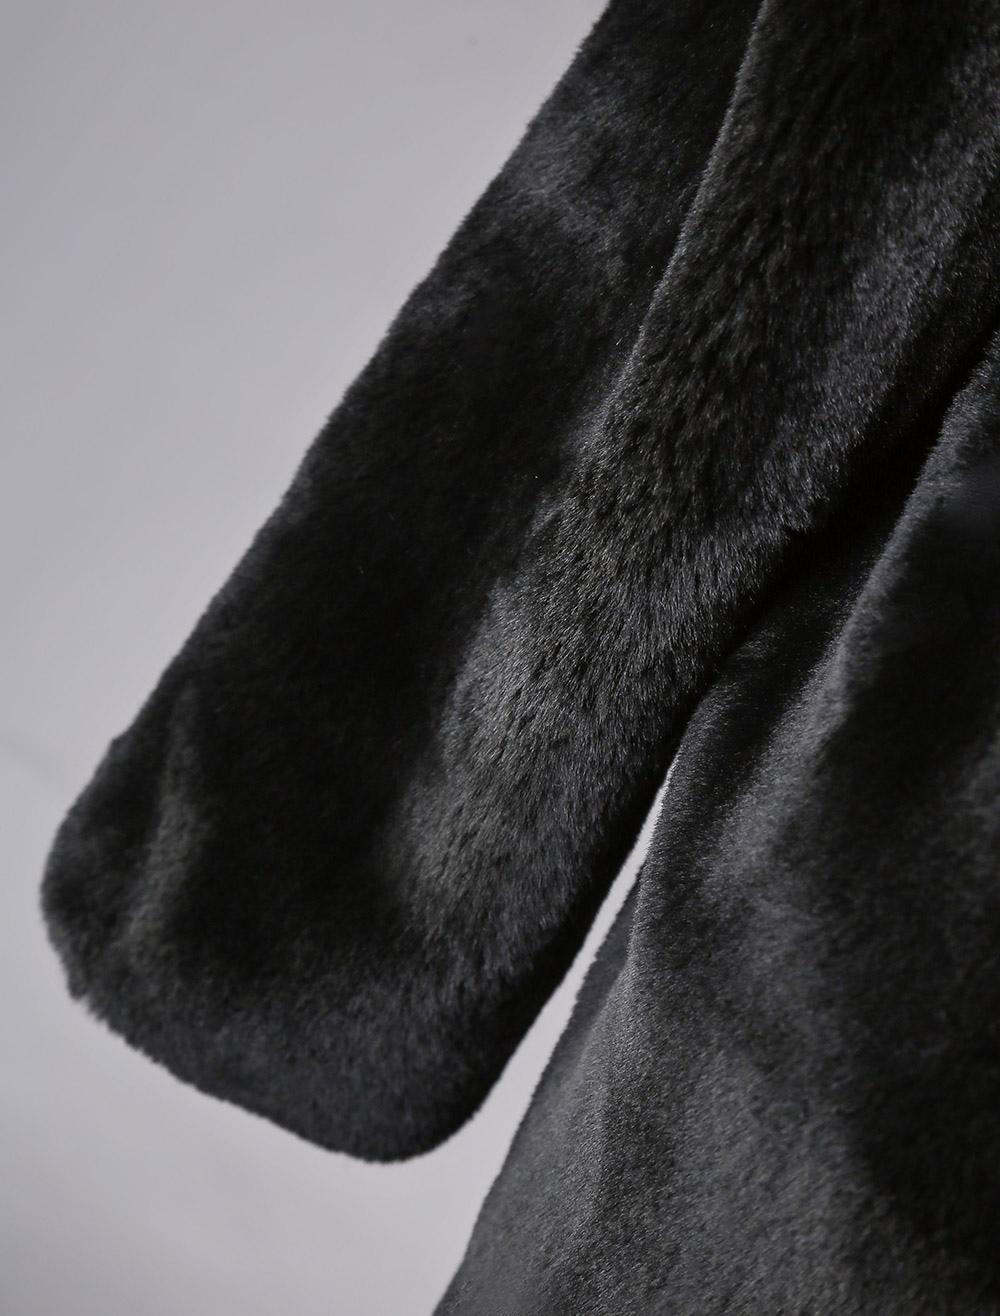 ... Chaquetas de lana artificia de mujer 2019 abrigo blanco con capucha de manga  larga corta invierno ... 967c3be0f34e